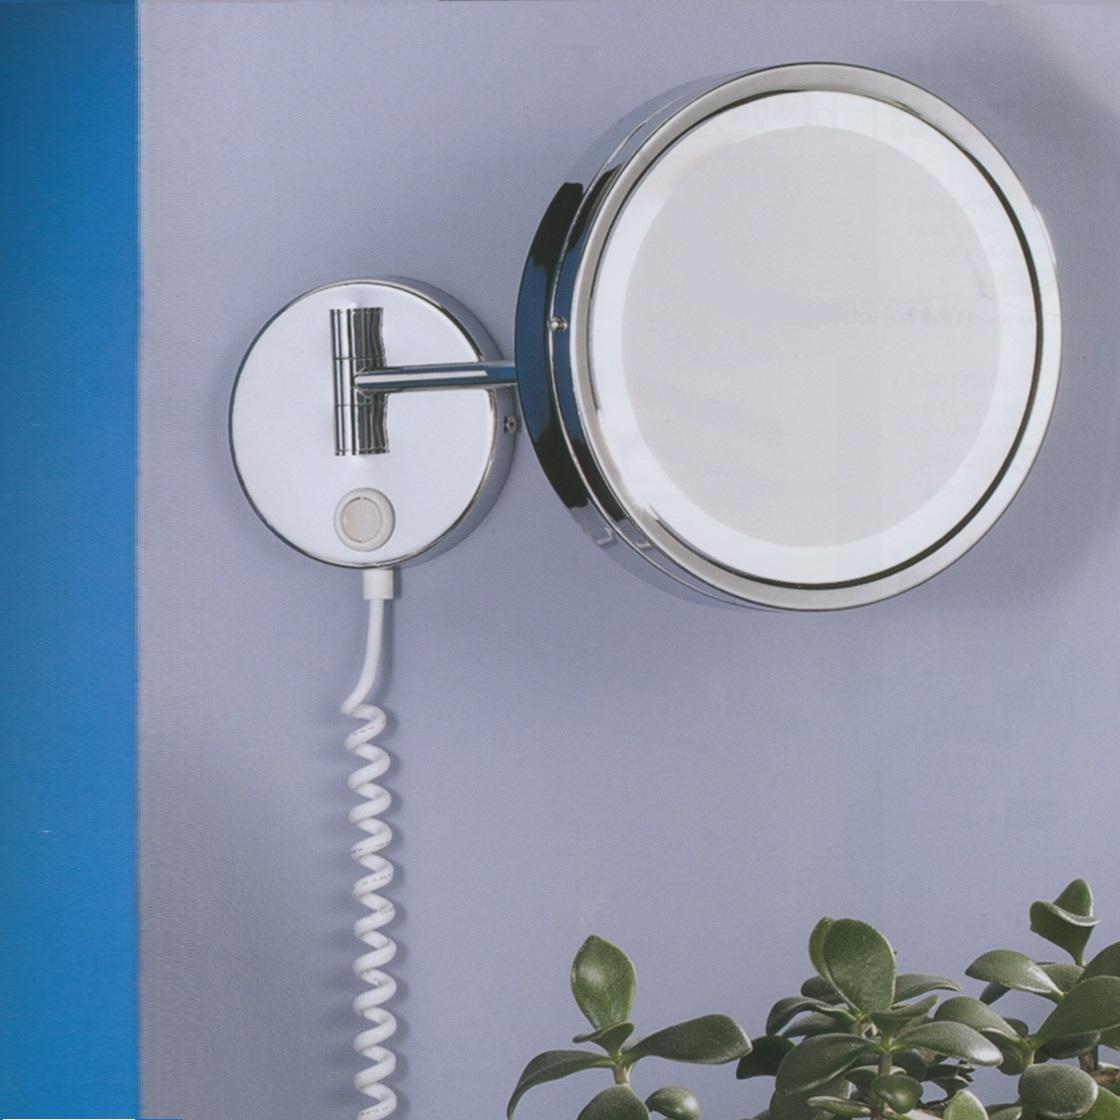 led kosmetikspiegel in chrom mit 3 fach vergr erung ip 44 inklusive led leuchtmittel. Black Bedroom Furniture Sets. Home Design Ideas